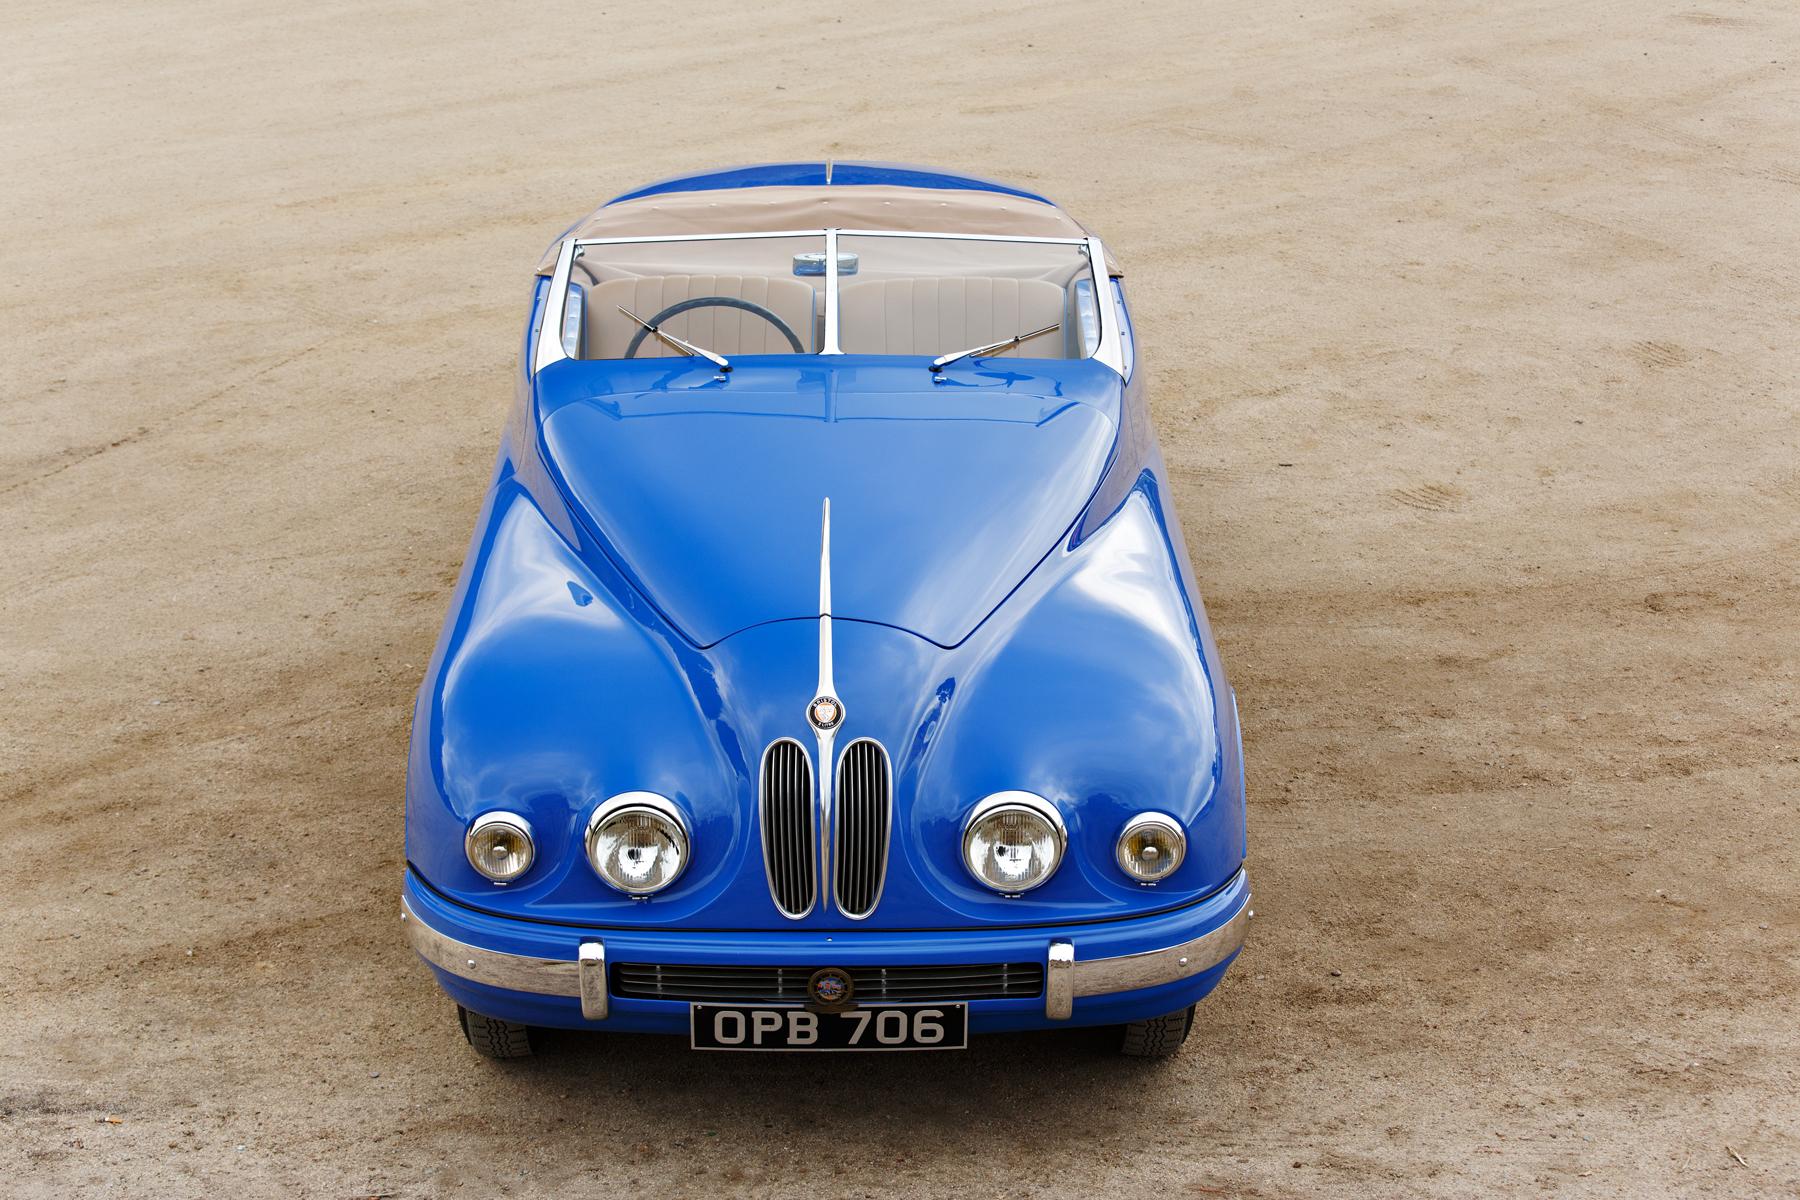 1949 Bristol 402 Cabriolet front overhead